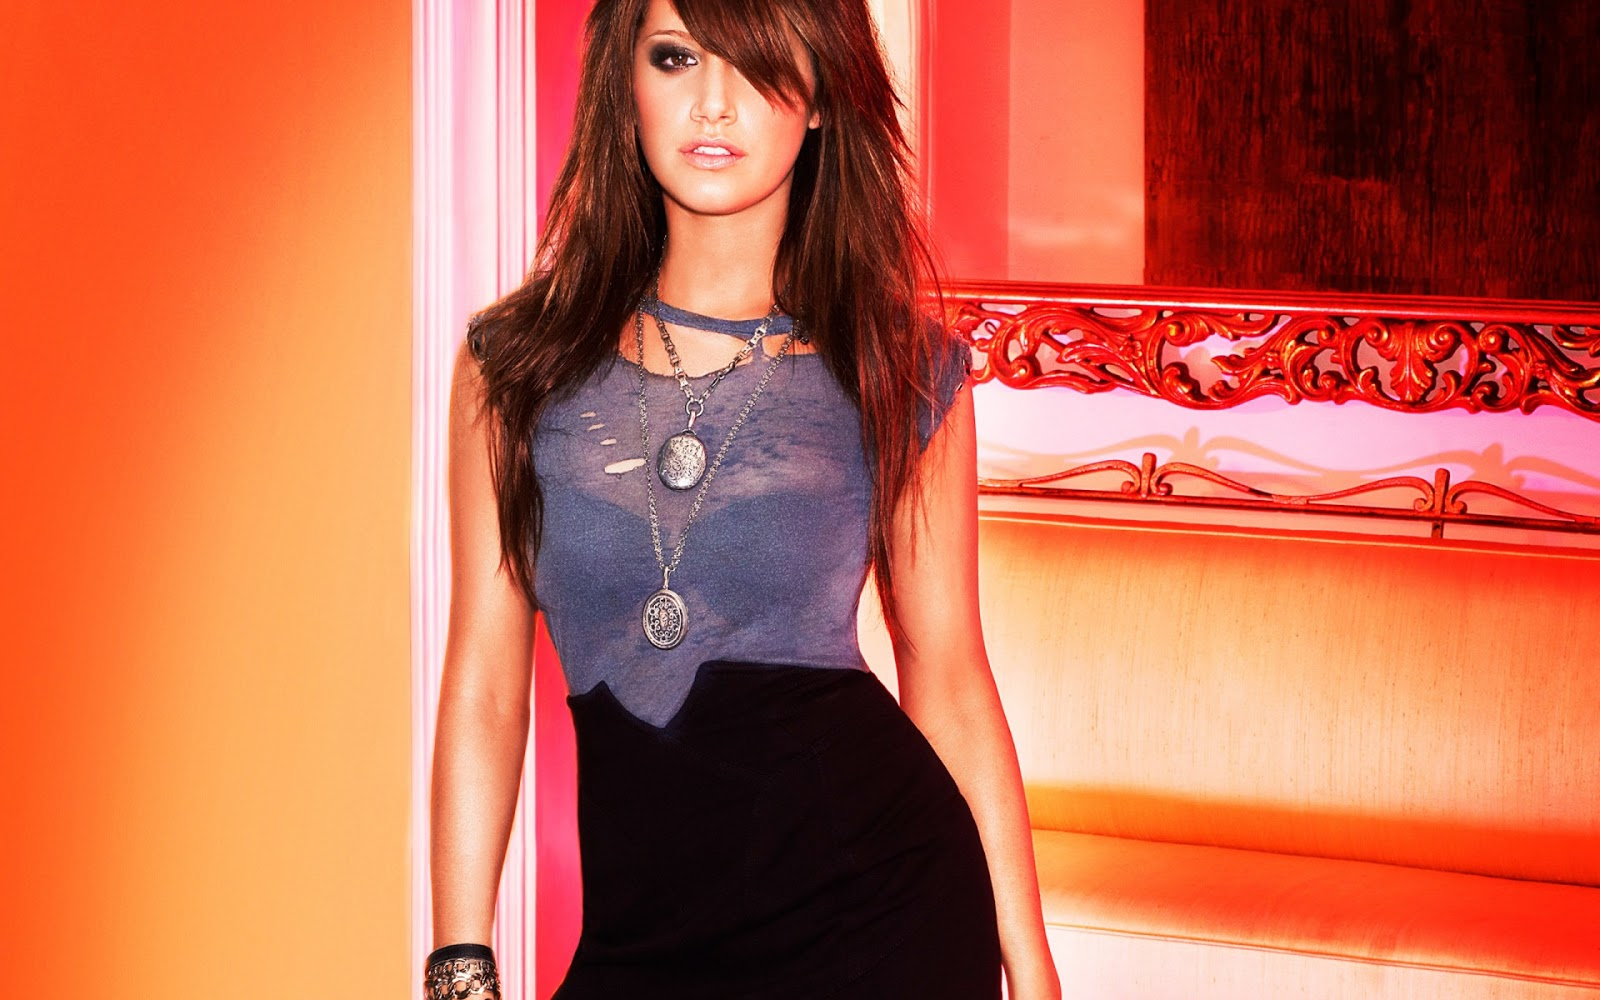 Ashley Tisdale Photo Shoot